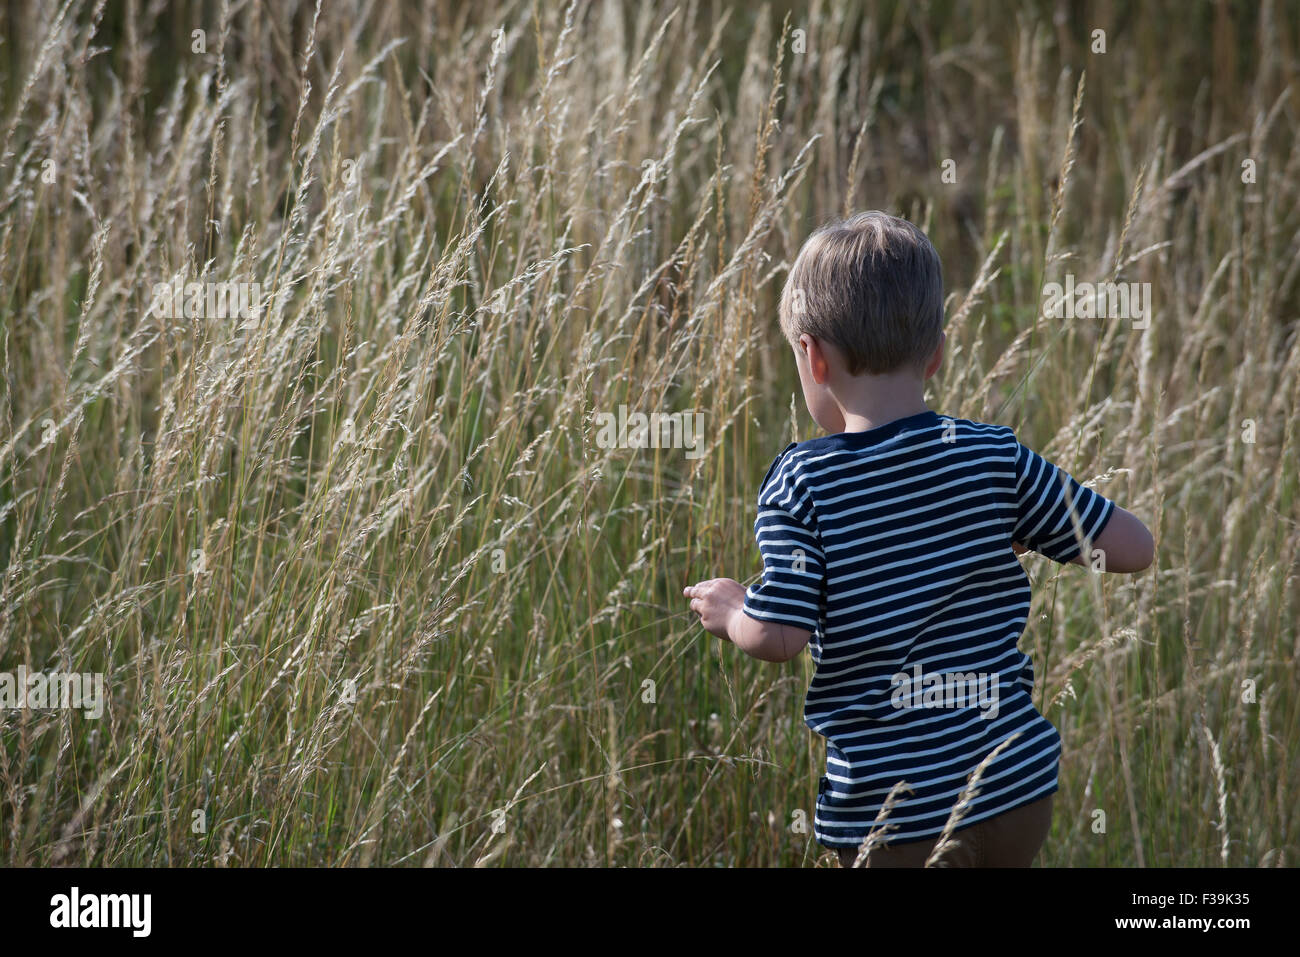 Rear view of a boy walking through long grass - Stock Image